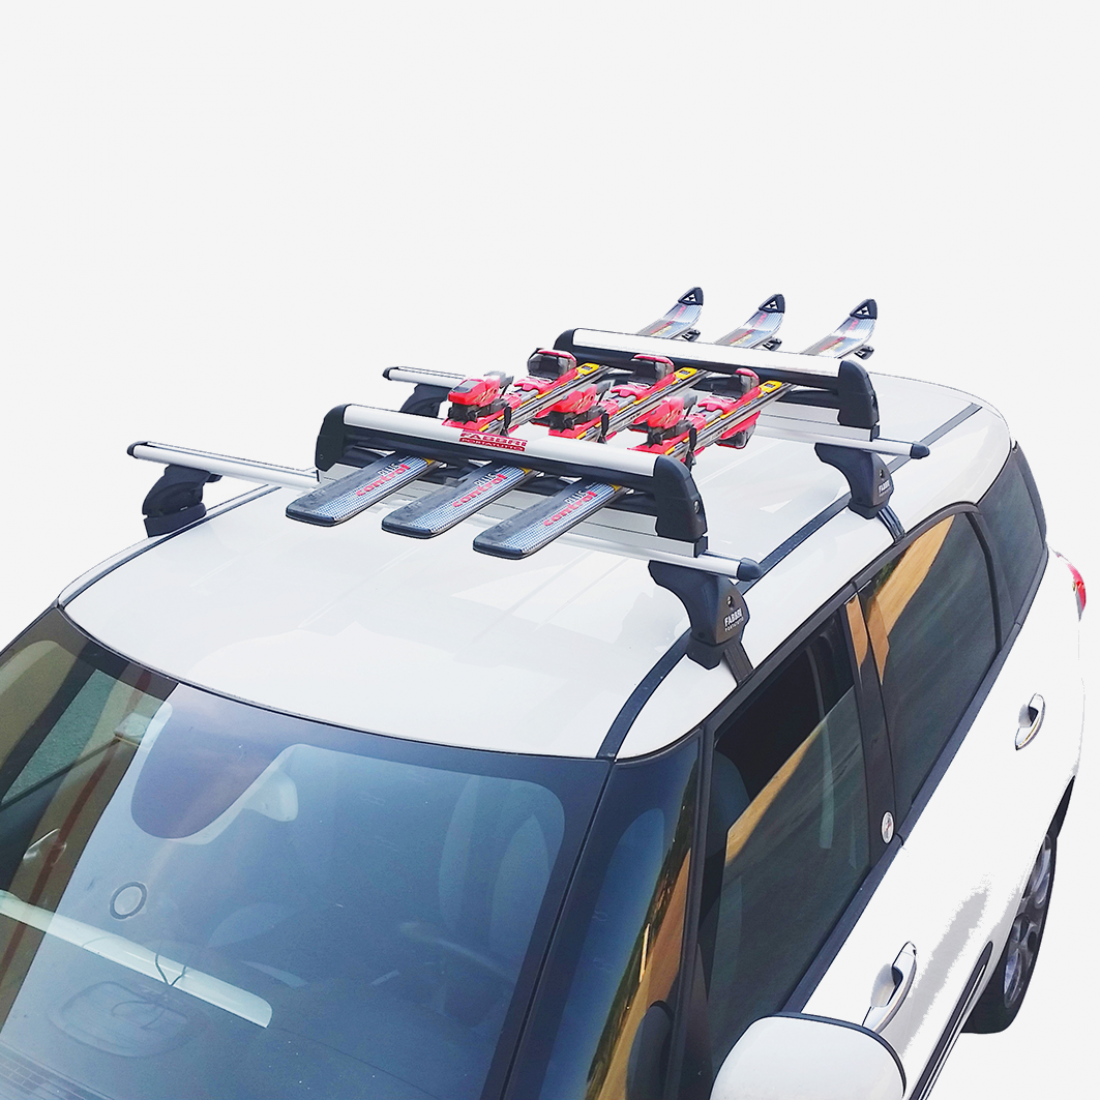 6801900 Porta-esquis / pranchas de snowboard, porta-bagagens tejadiho FABBRI - Experiência a preços com desconto